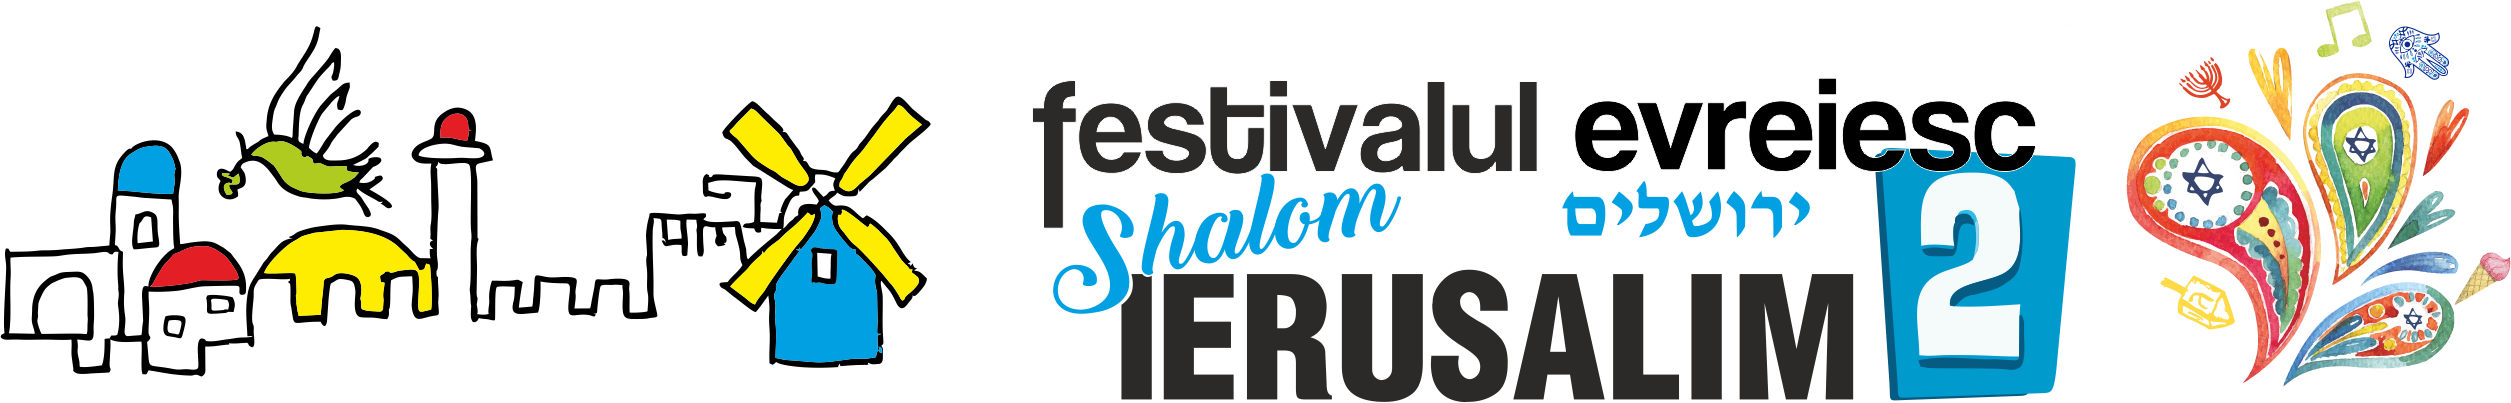 "Festivalul Evreiesc ""Shalom Ierusalim"" 2018"